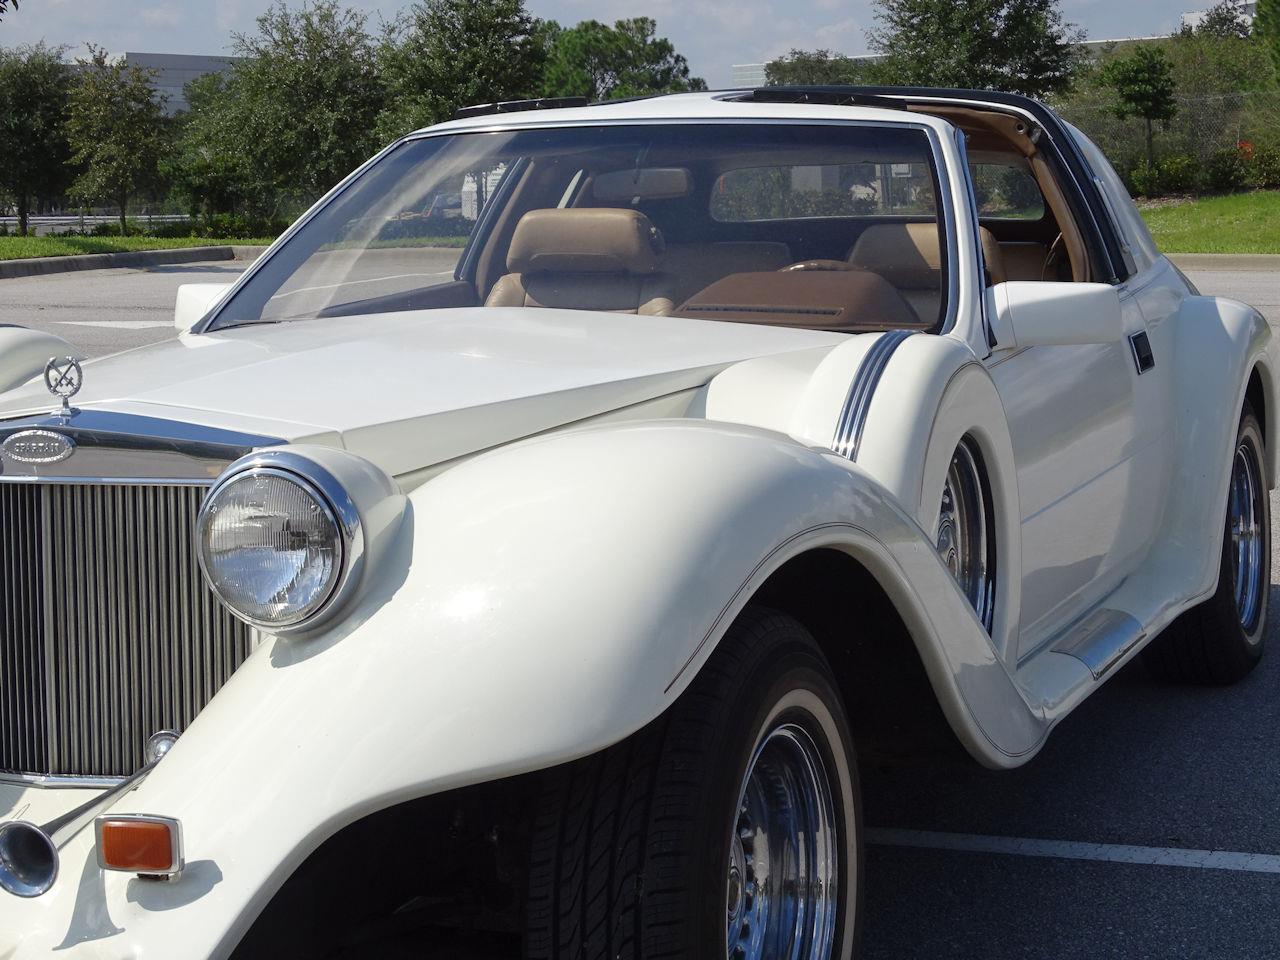 1985 Spartan II (CC-1414989) for sale in O'Fallon, Illinois